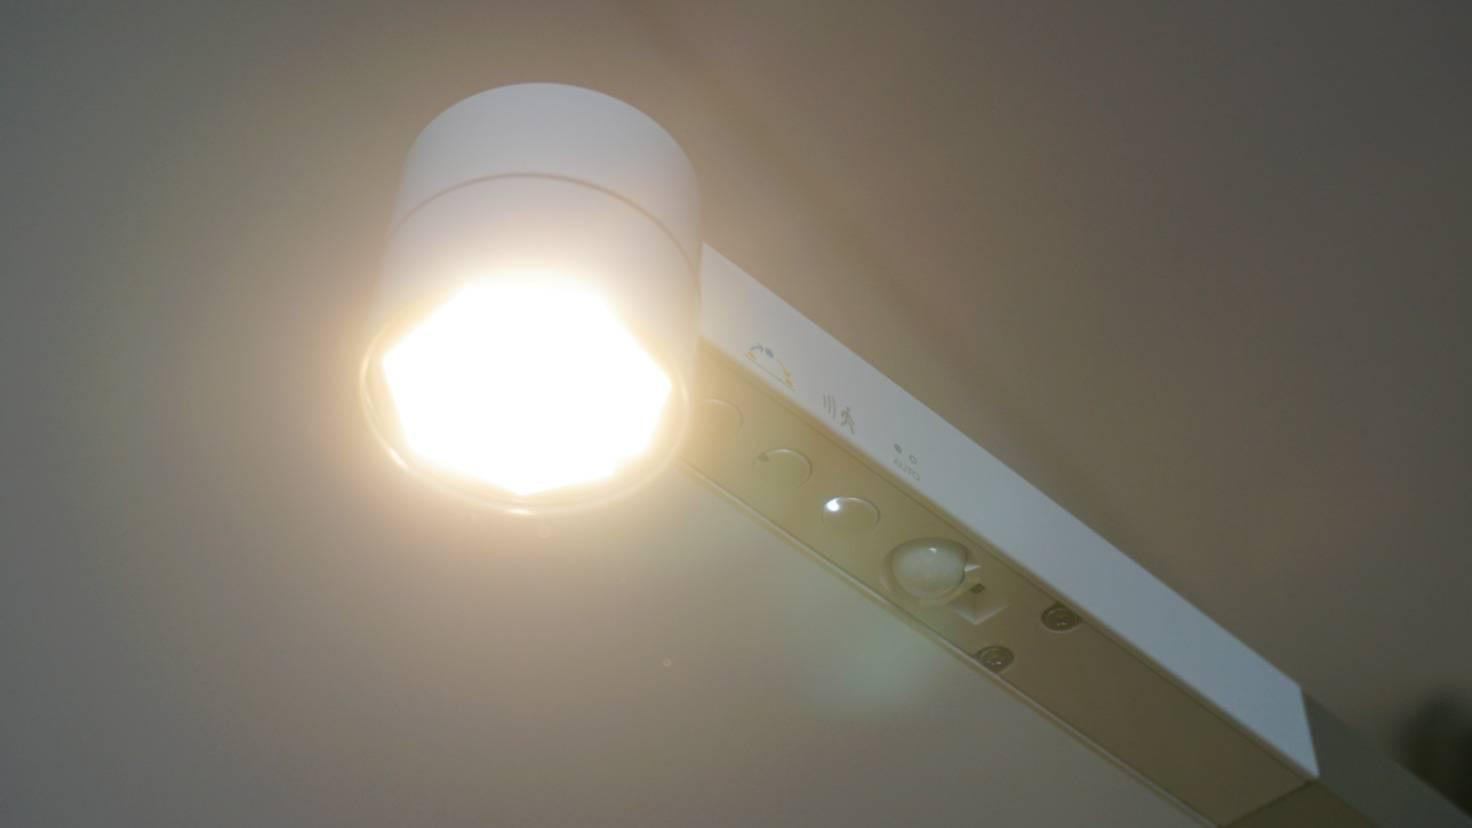 Dyson Lightcycle Morph LED